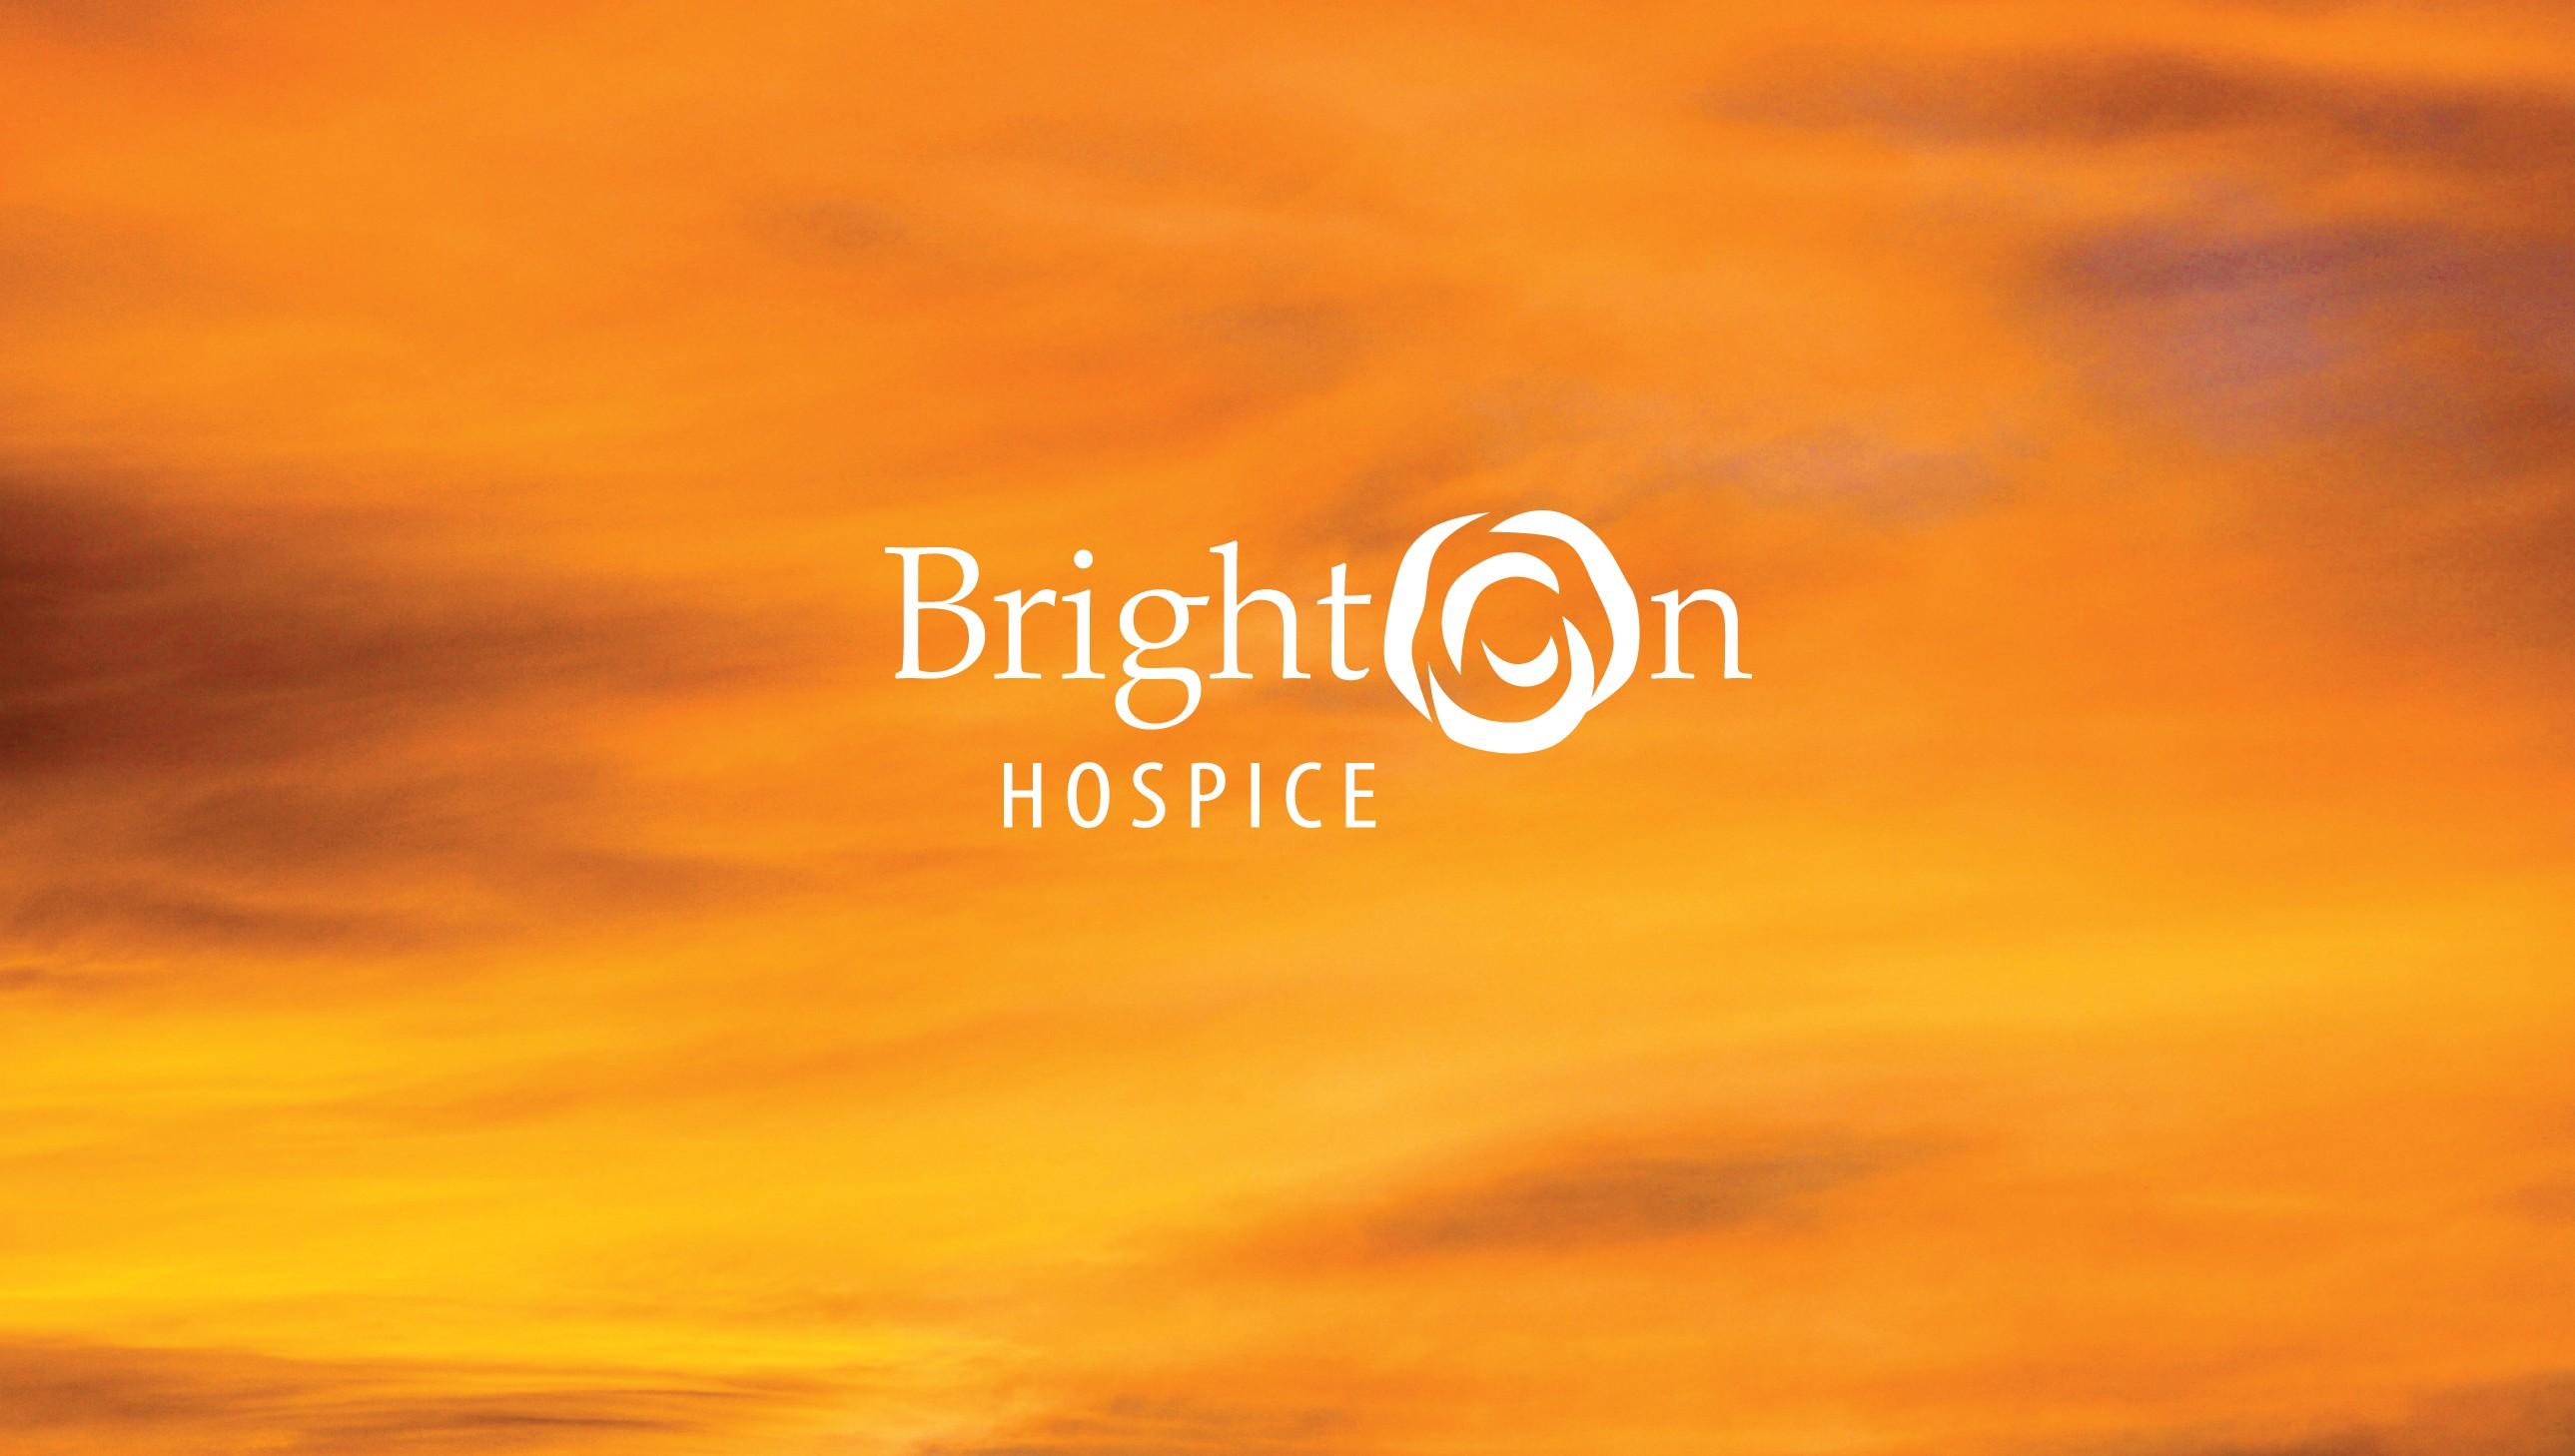 Brighton Hospice | LinkedIn